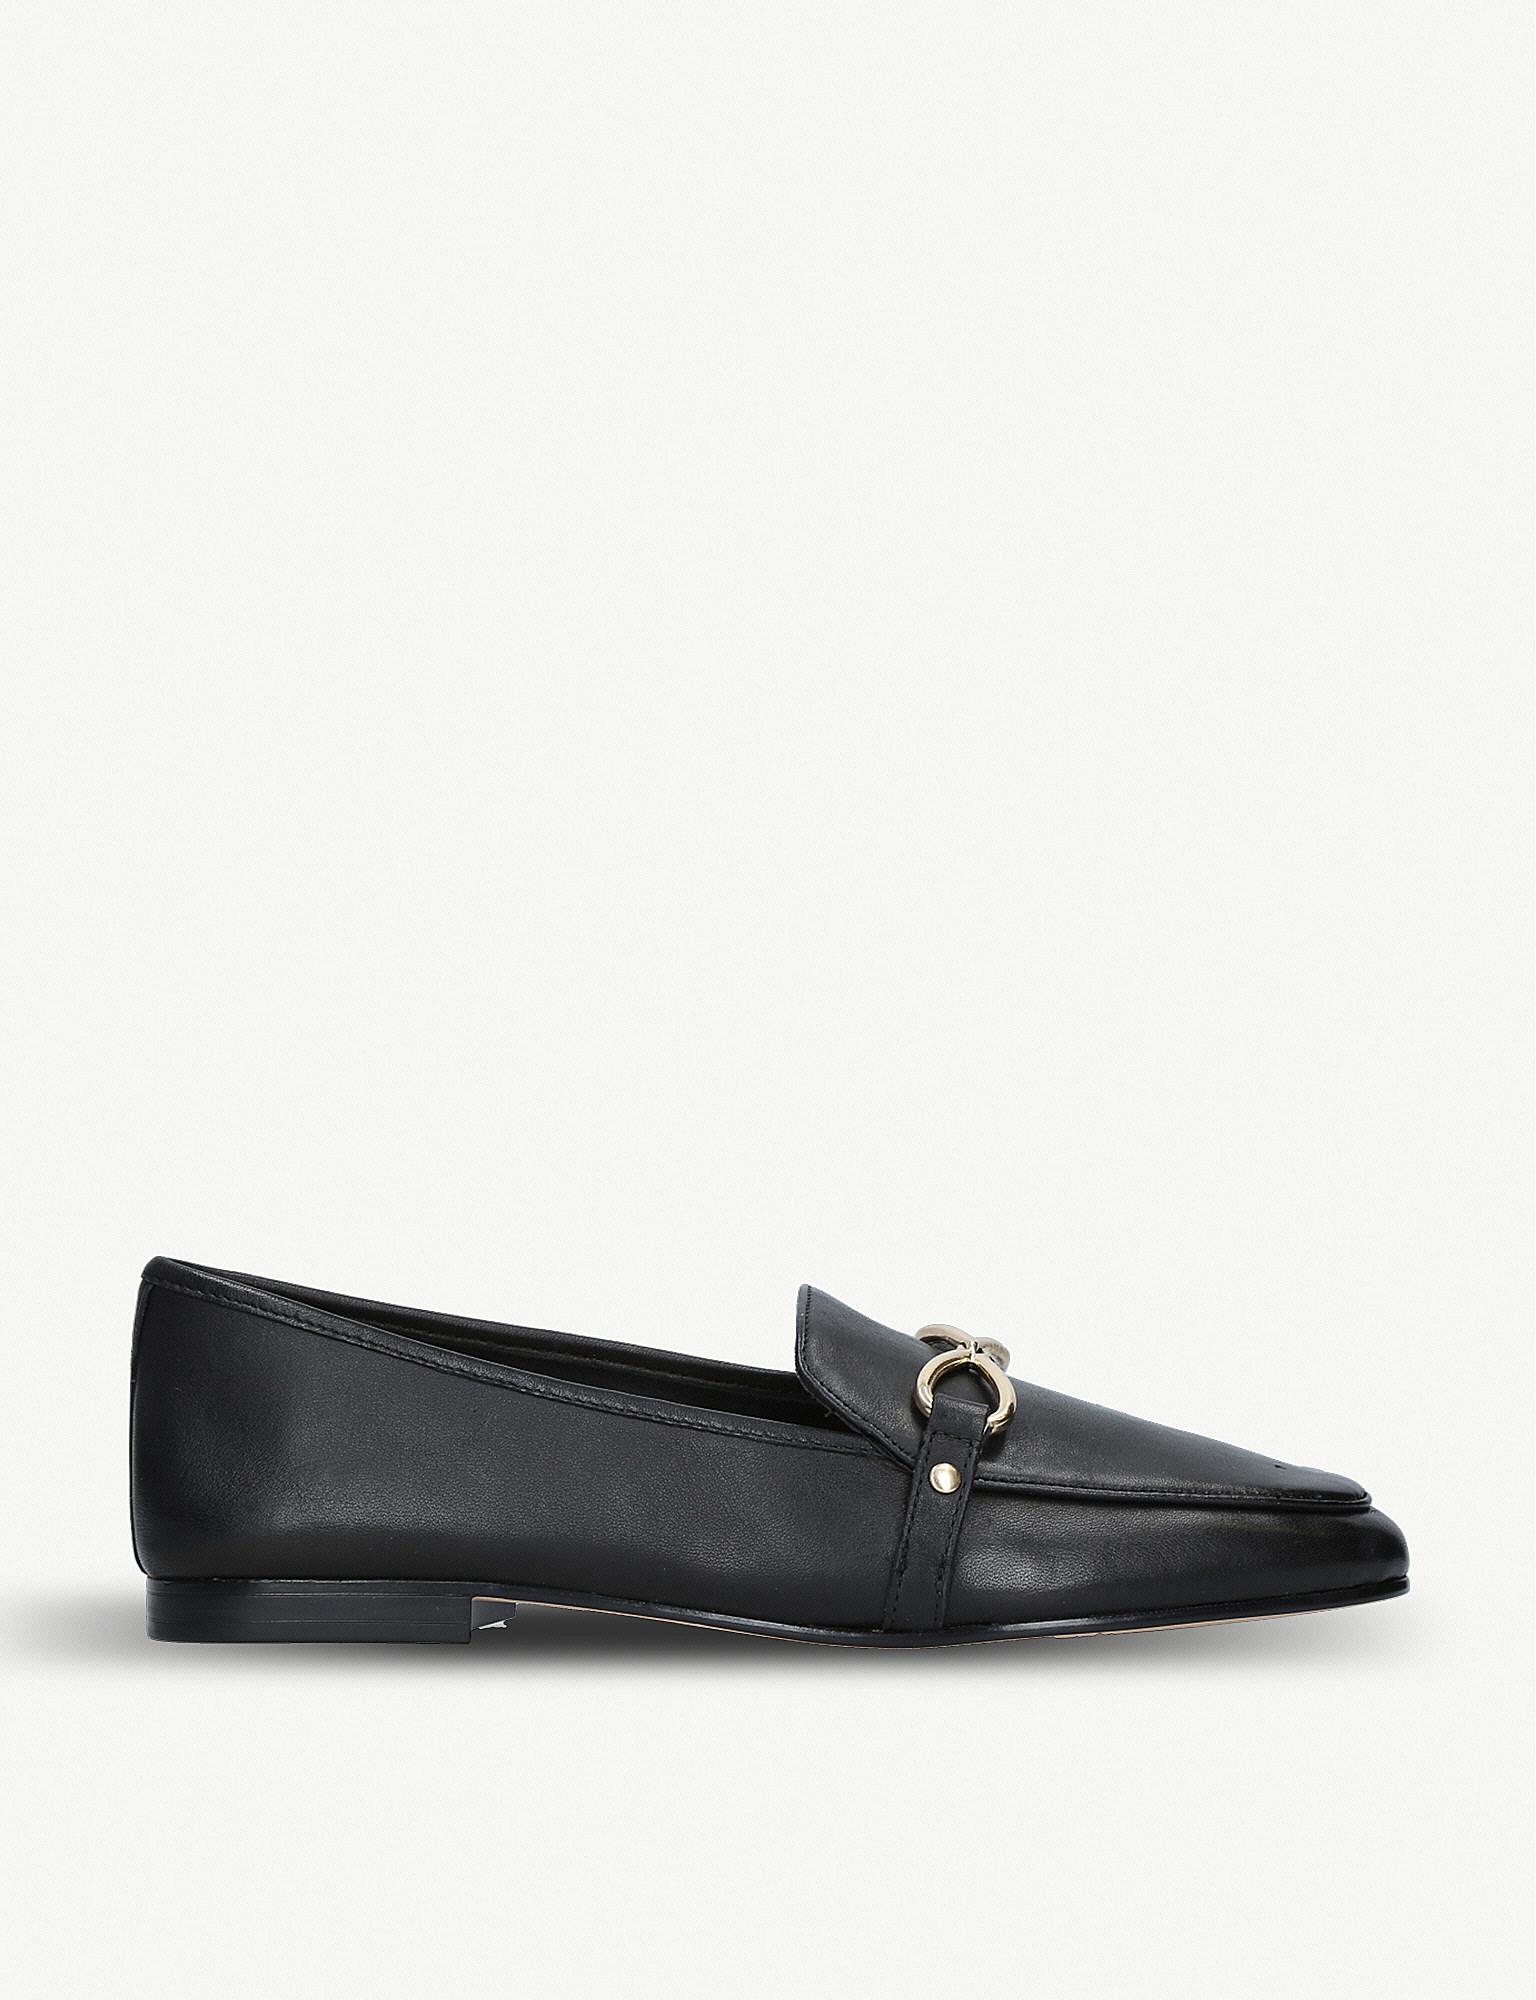 5d5661de8ba Lyst - ALDO Afaucia Leather Loafers in Black